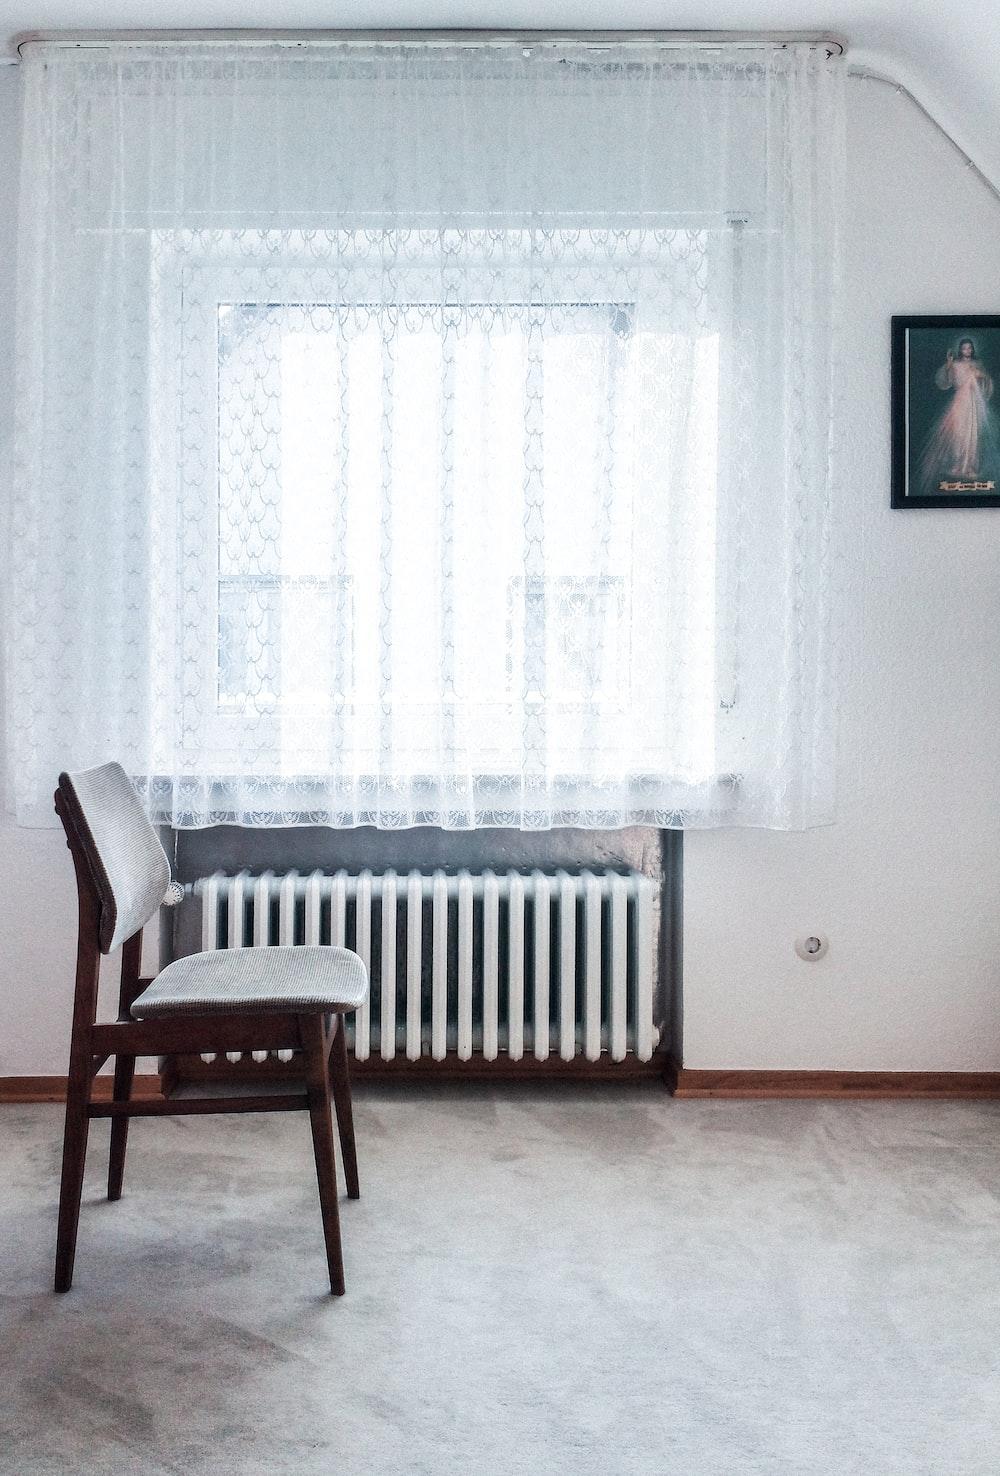 brown chair beside white radiator heater